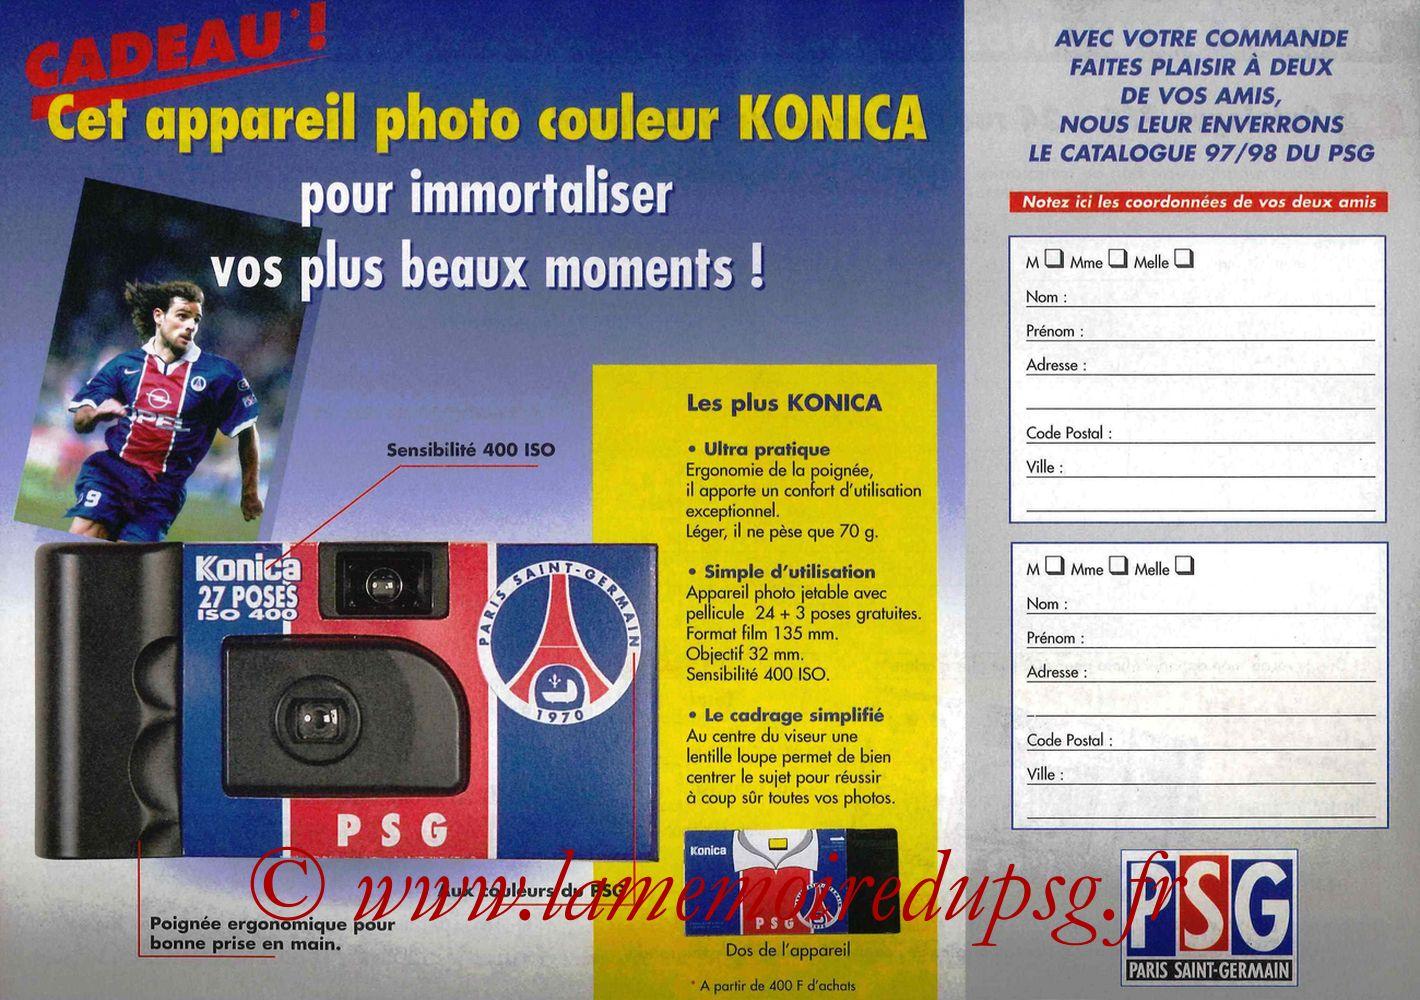 Catalogue PSG - 1997-98 - Bon de commande 1